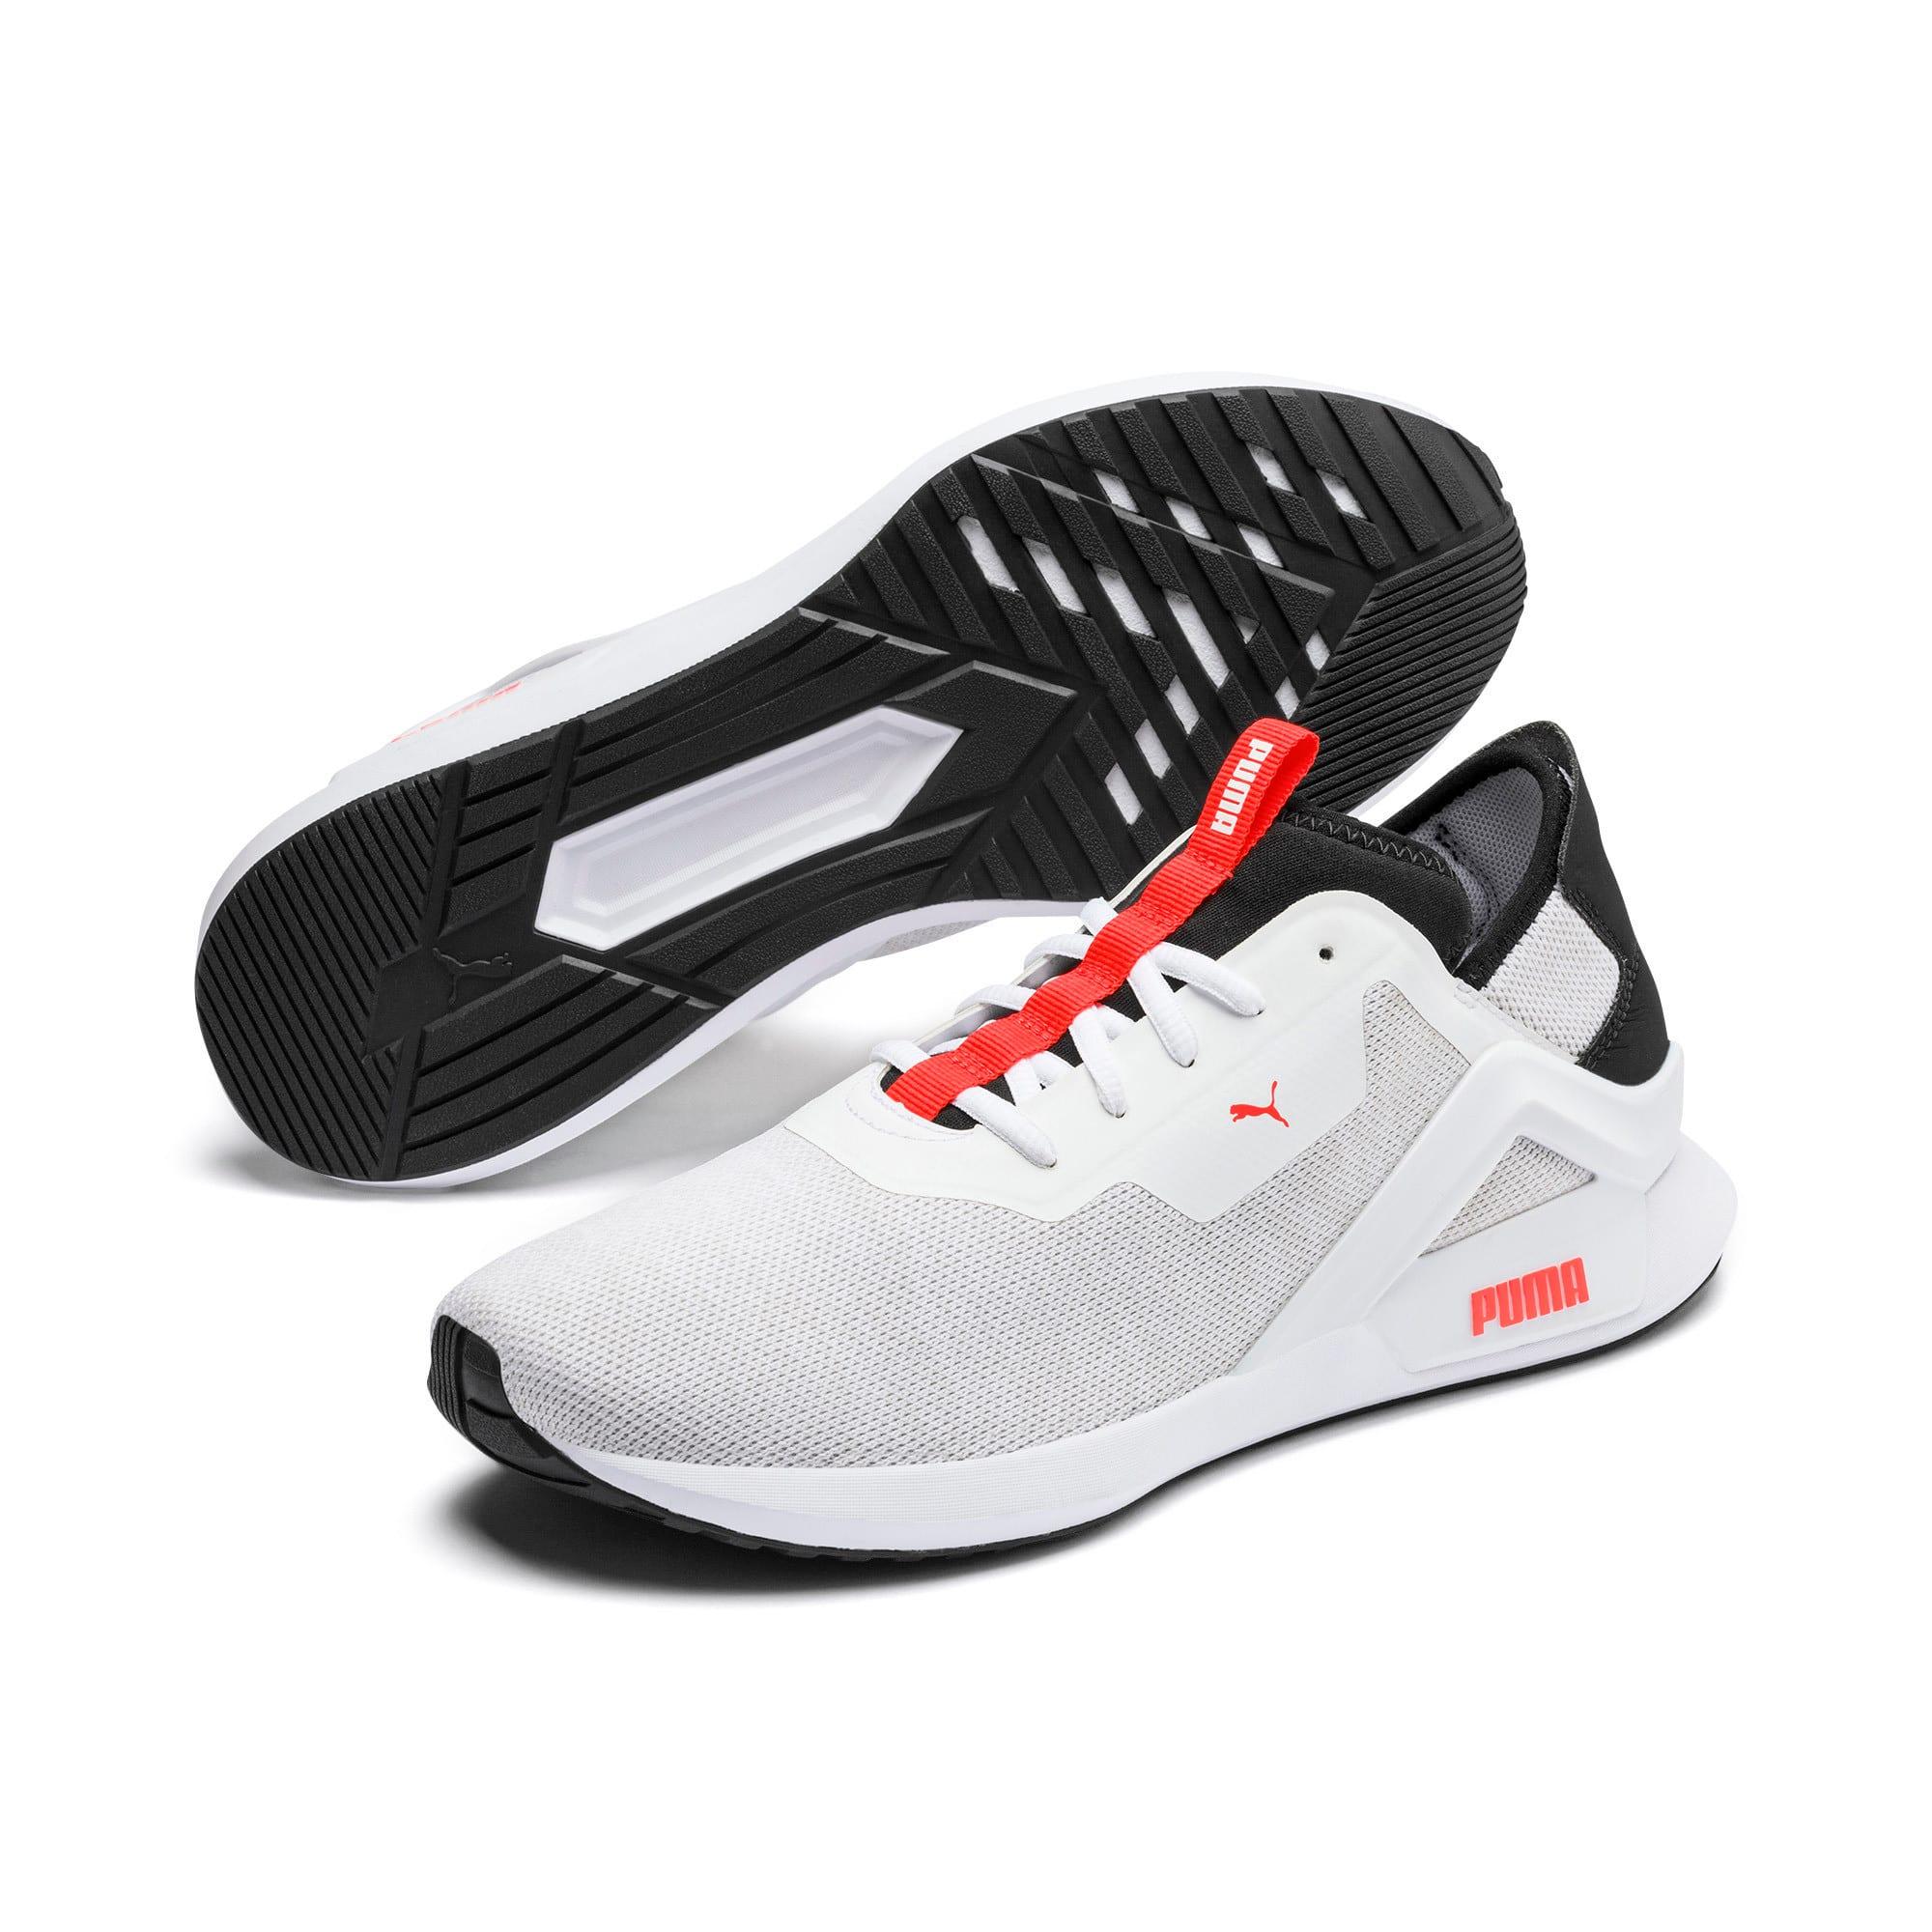 Thumbnail 3 of Rogue X Knit Herren Sneaker, White-Black-Nrgy Red, medium